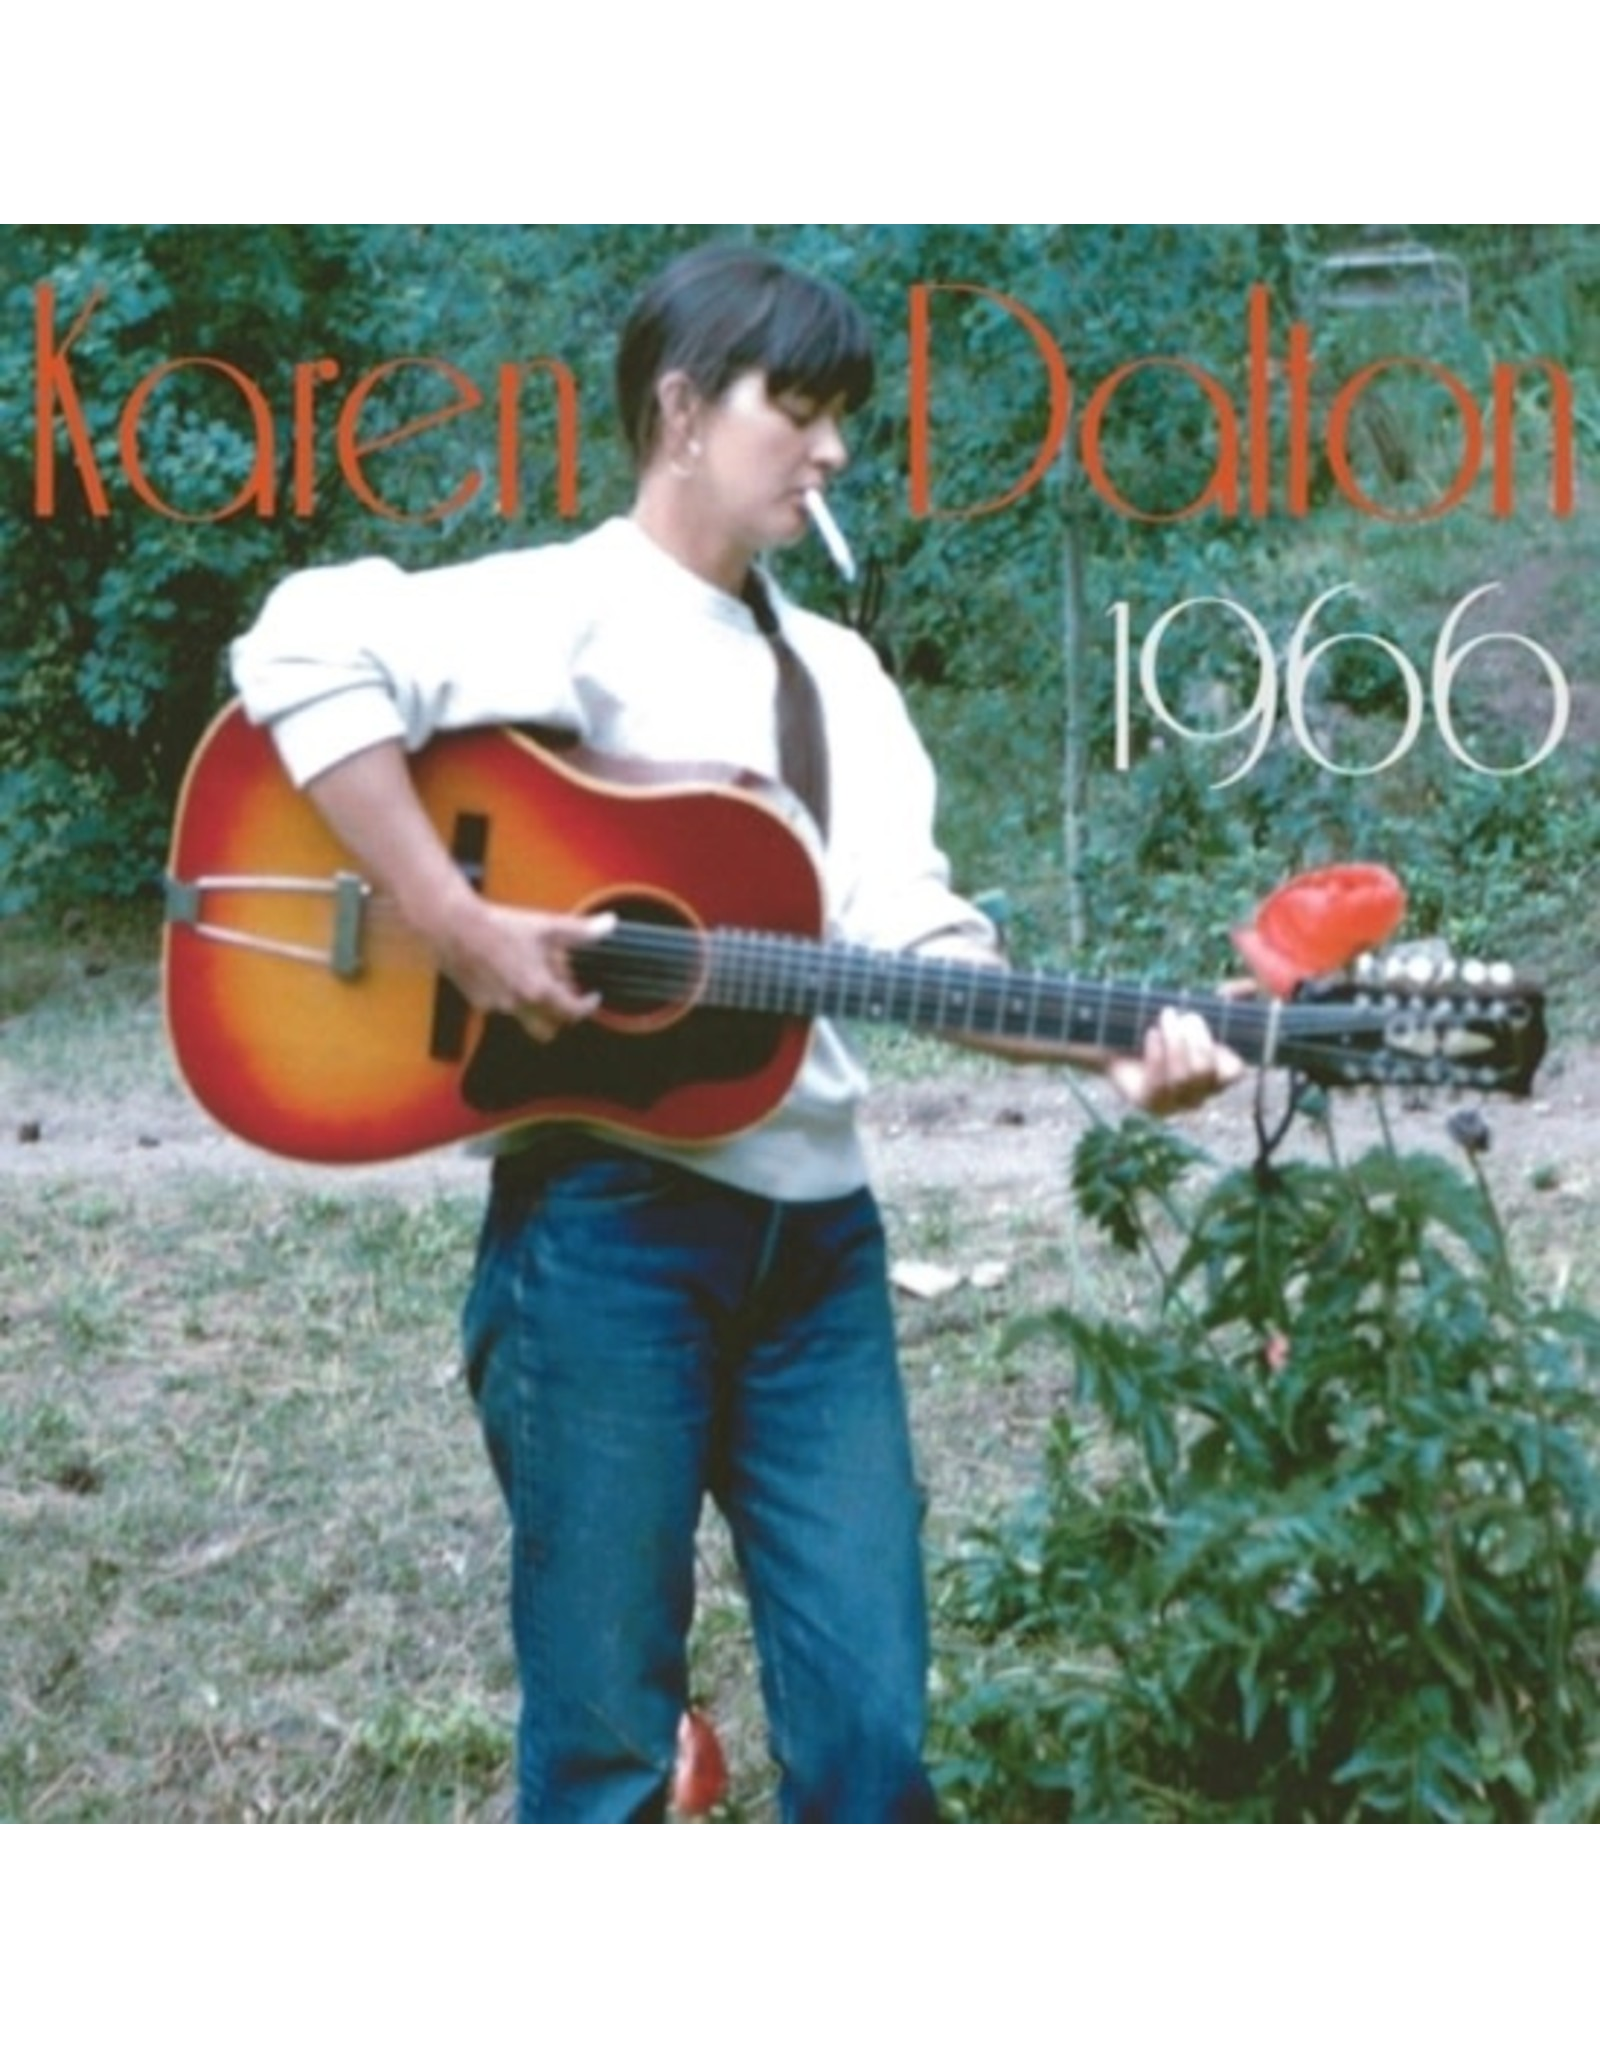 New Vinyl Karen Dalton - 1966 (Colored) LP